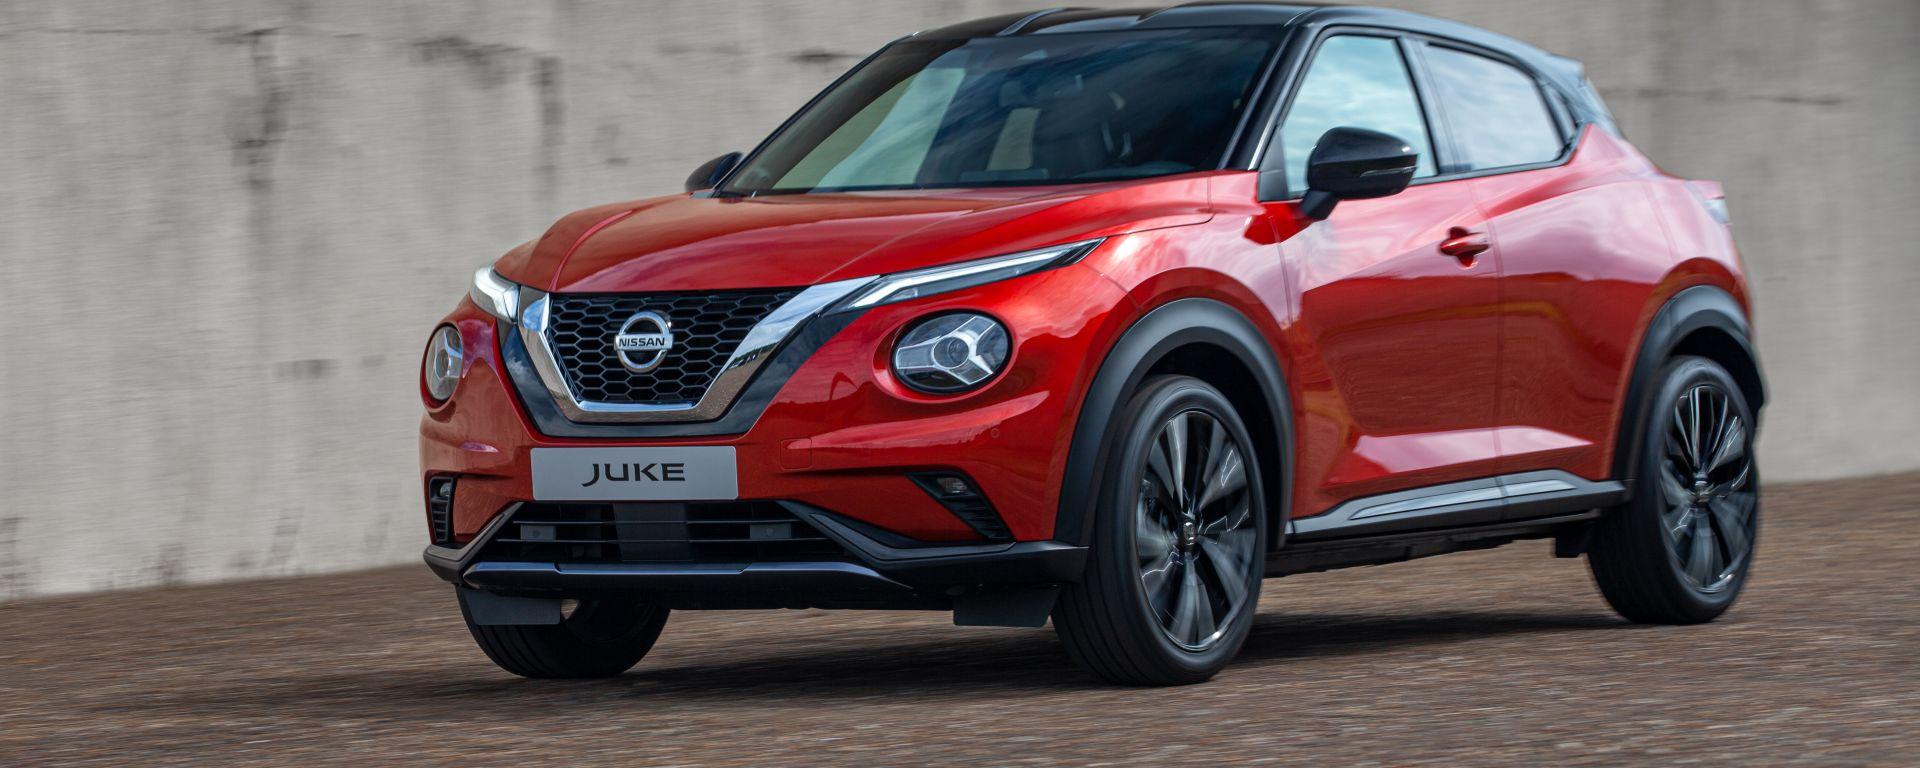 Nuova Nissan Juke 2020 Motore Interni Prezzo Opinioni Motorbox